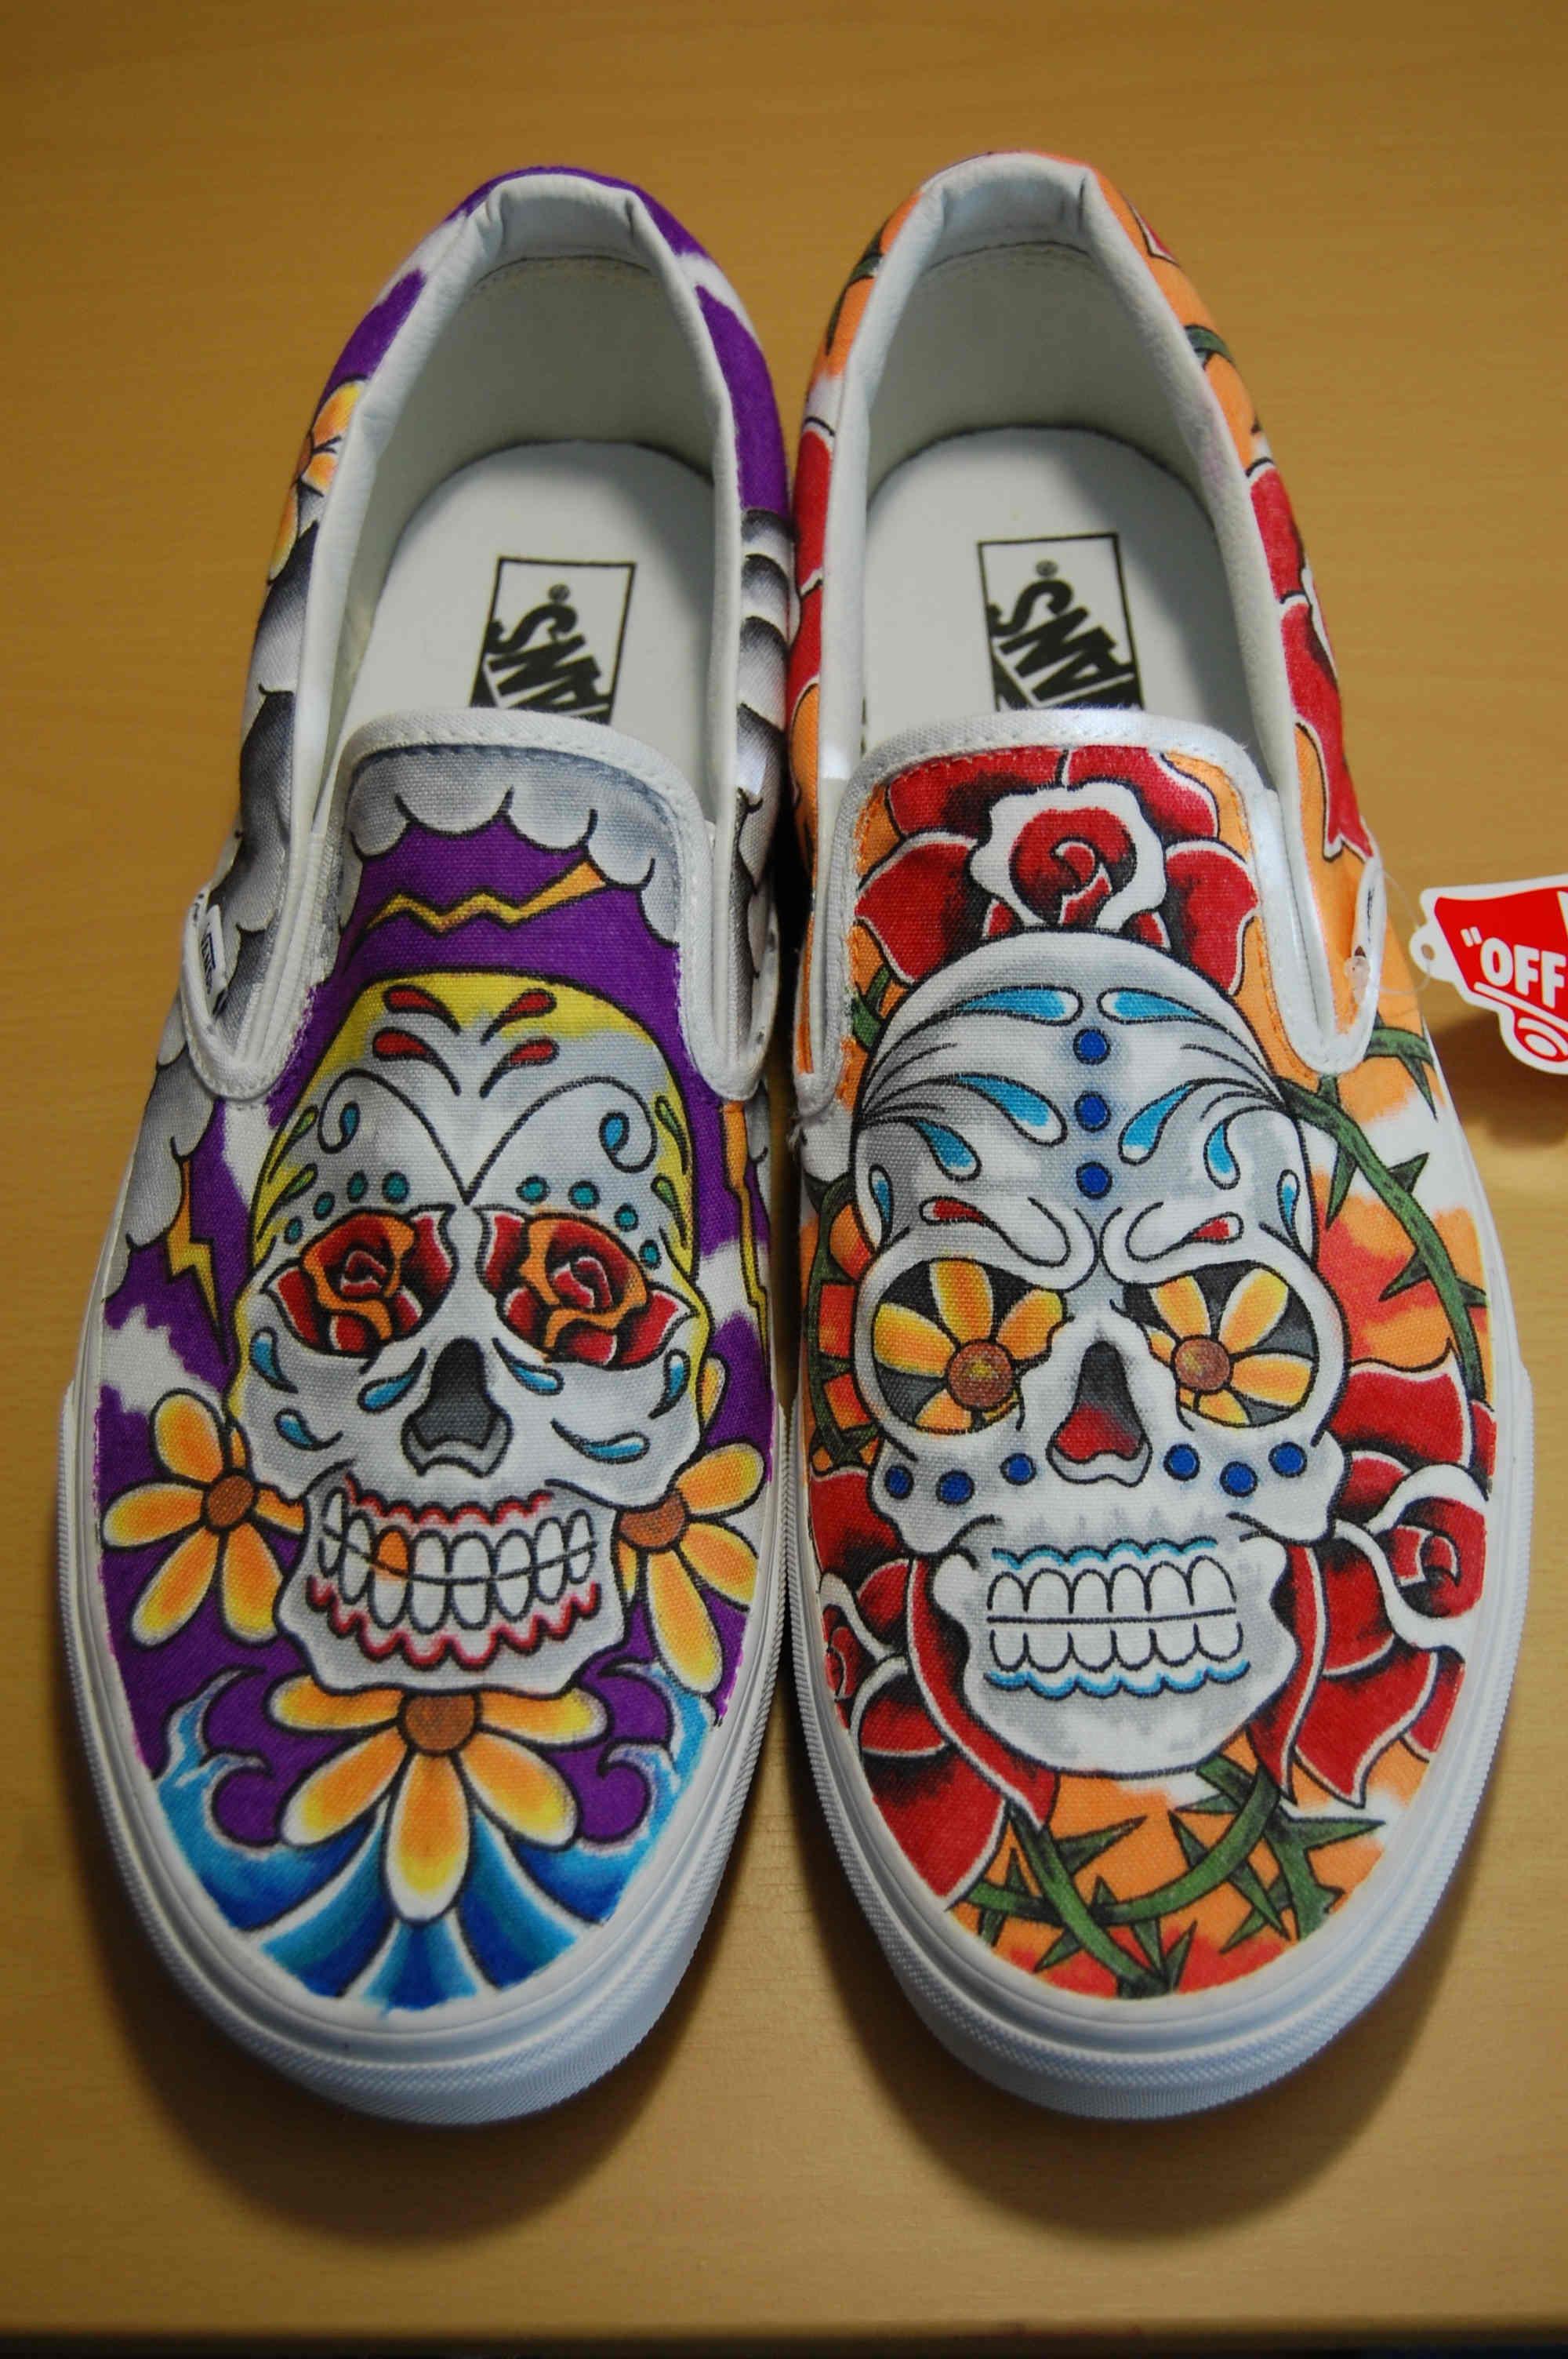 Levis Shoes   Ram Lee Tattoo ArtRam Lee Tattoo Art